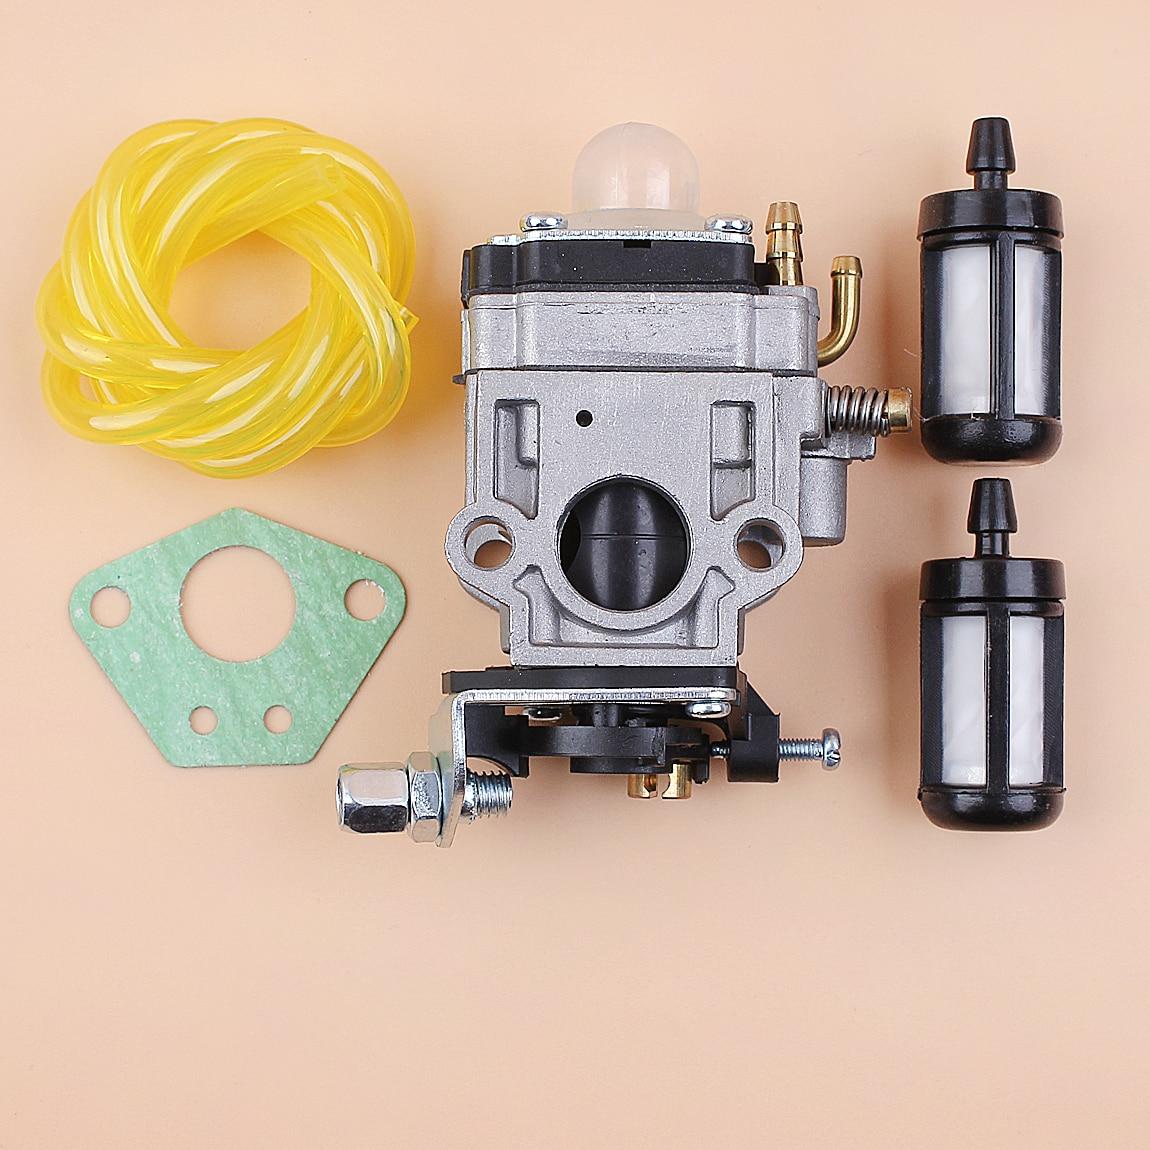 20 Pack Primer Bulb 188-12 For Homelite Echo Stihl Shindaiwa Carb Priming Bulb